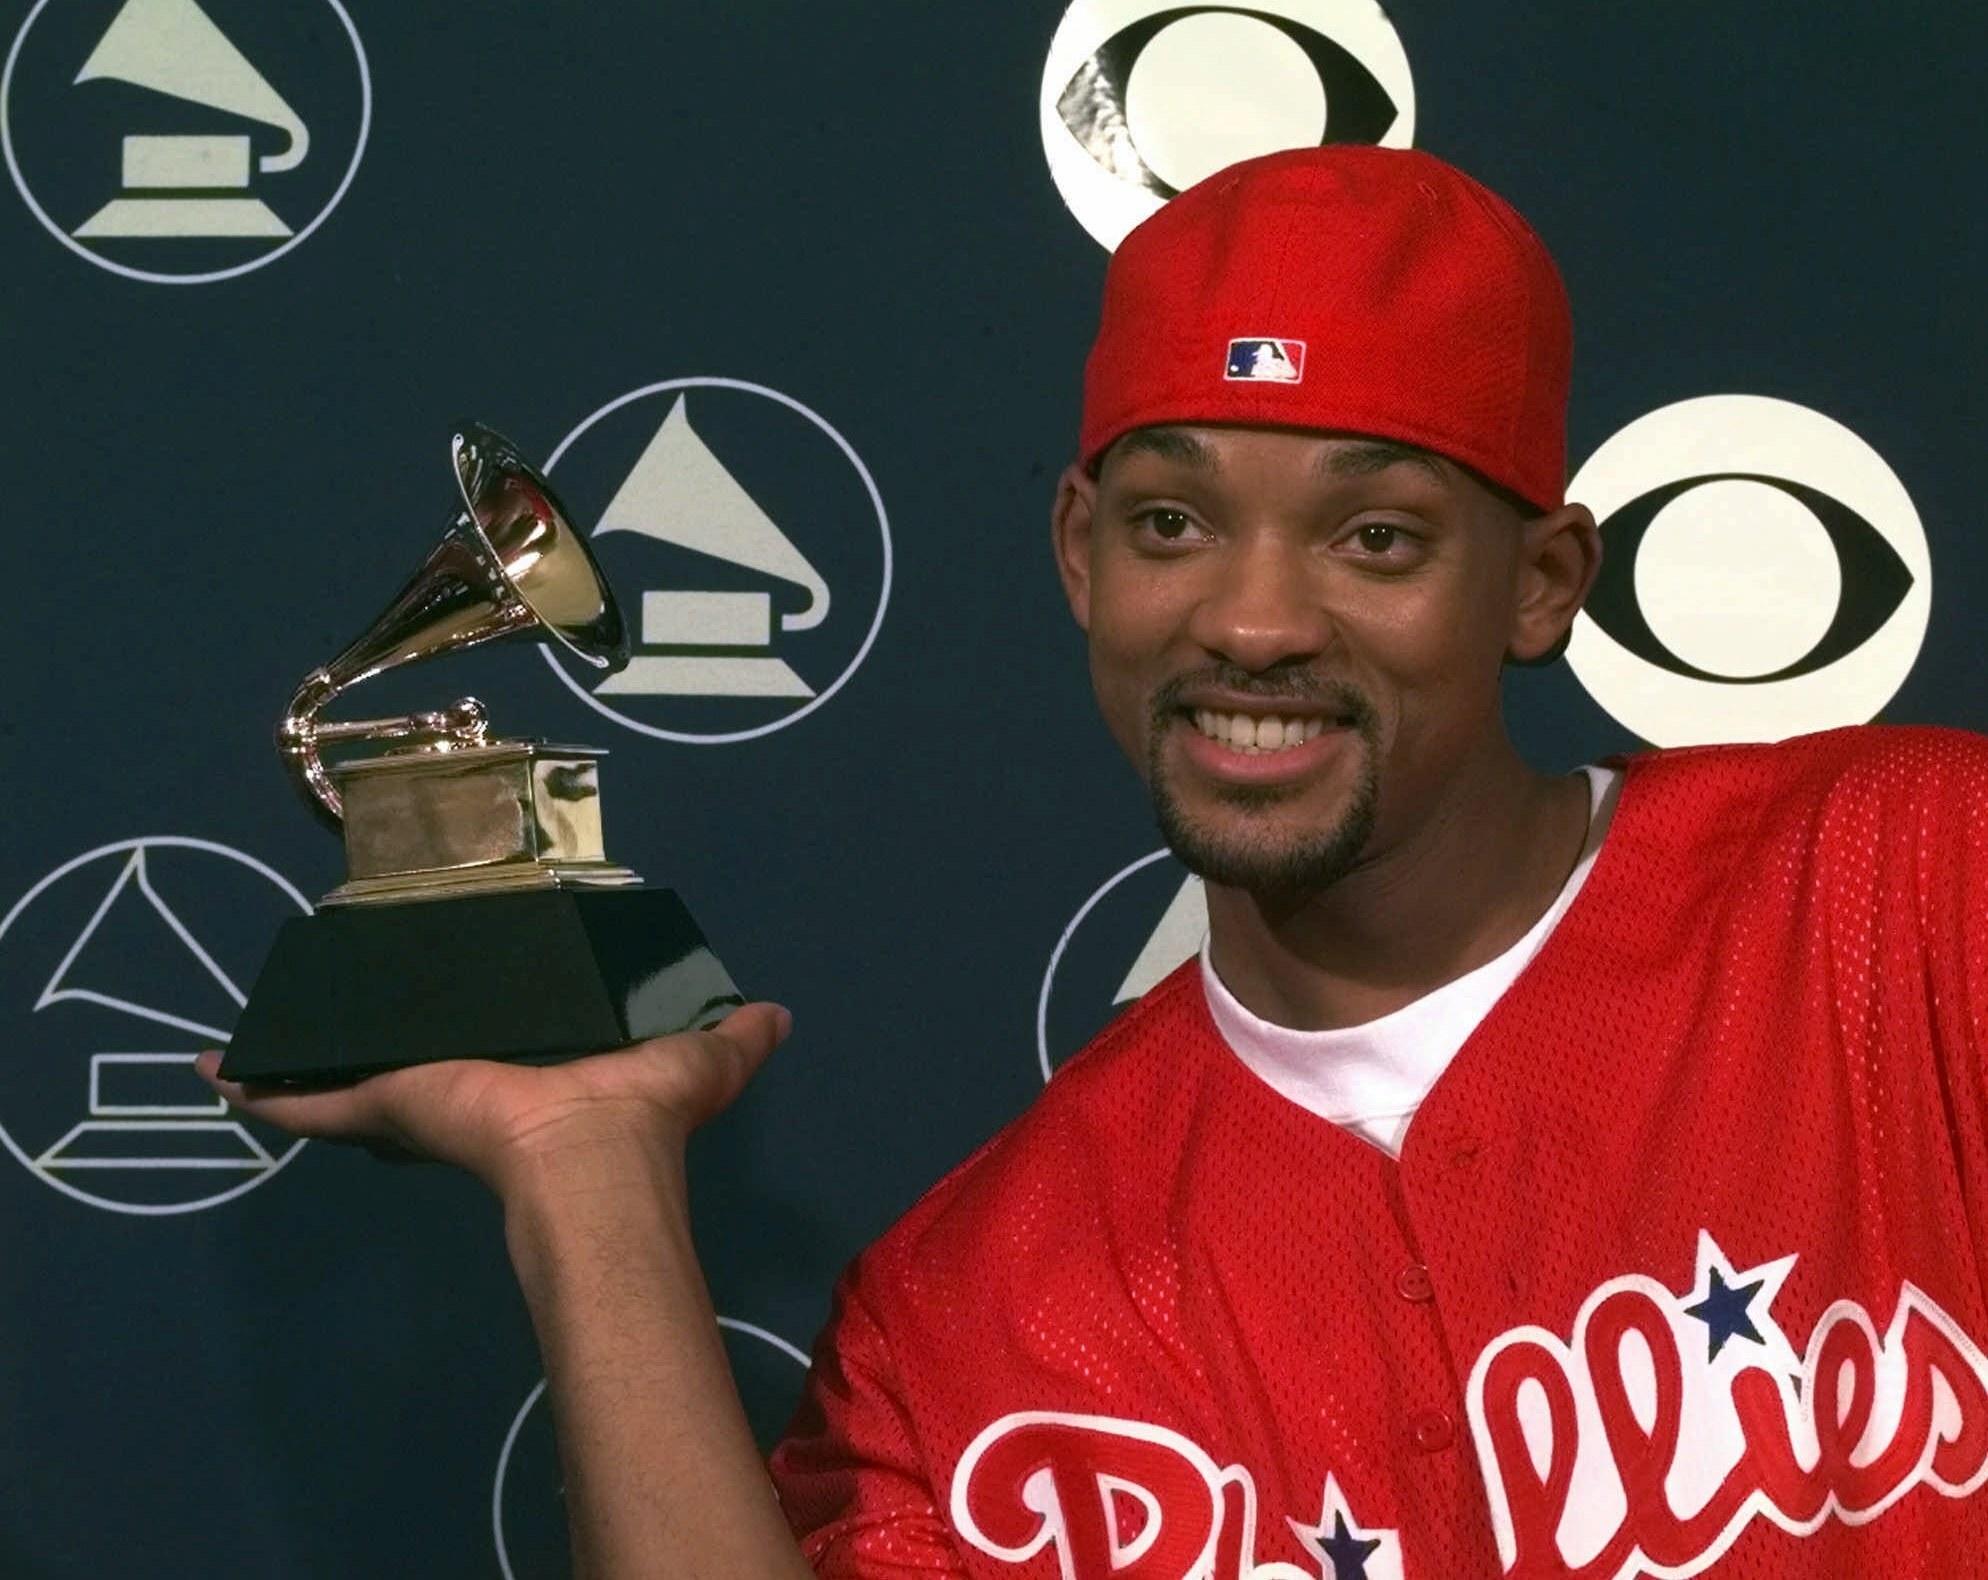 With a Grammy Award